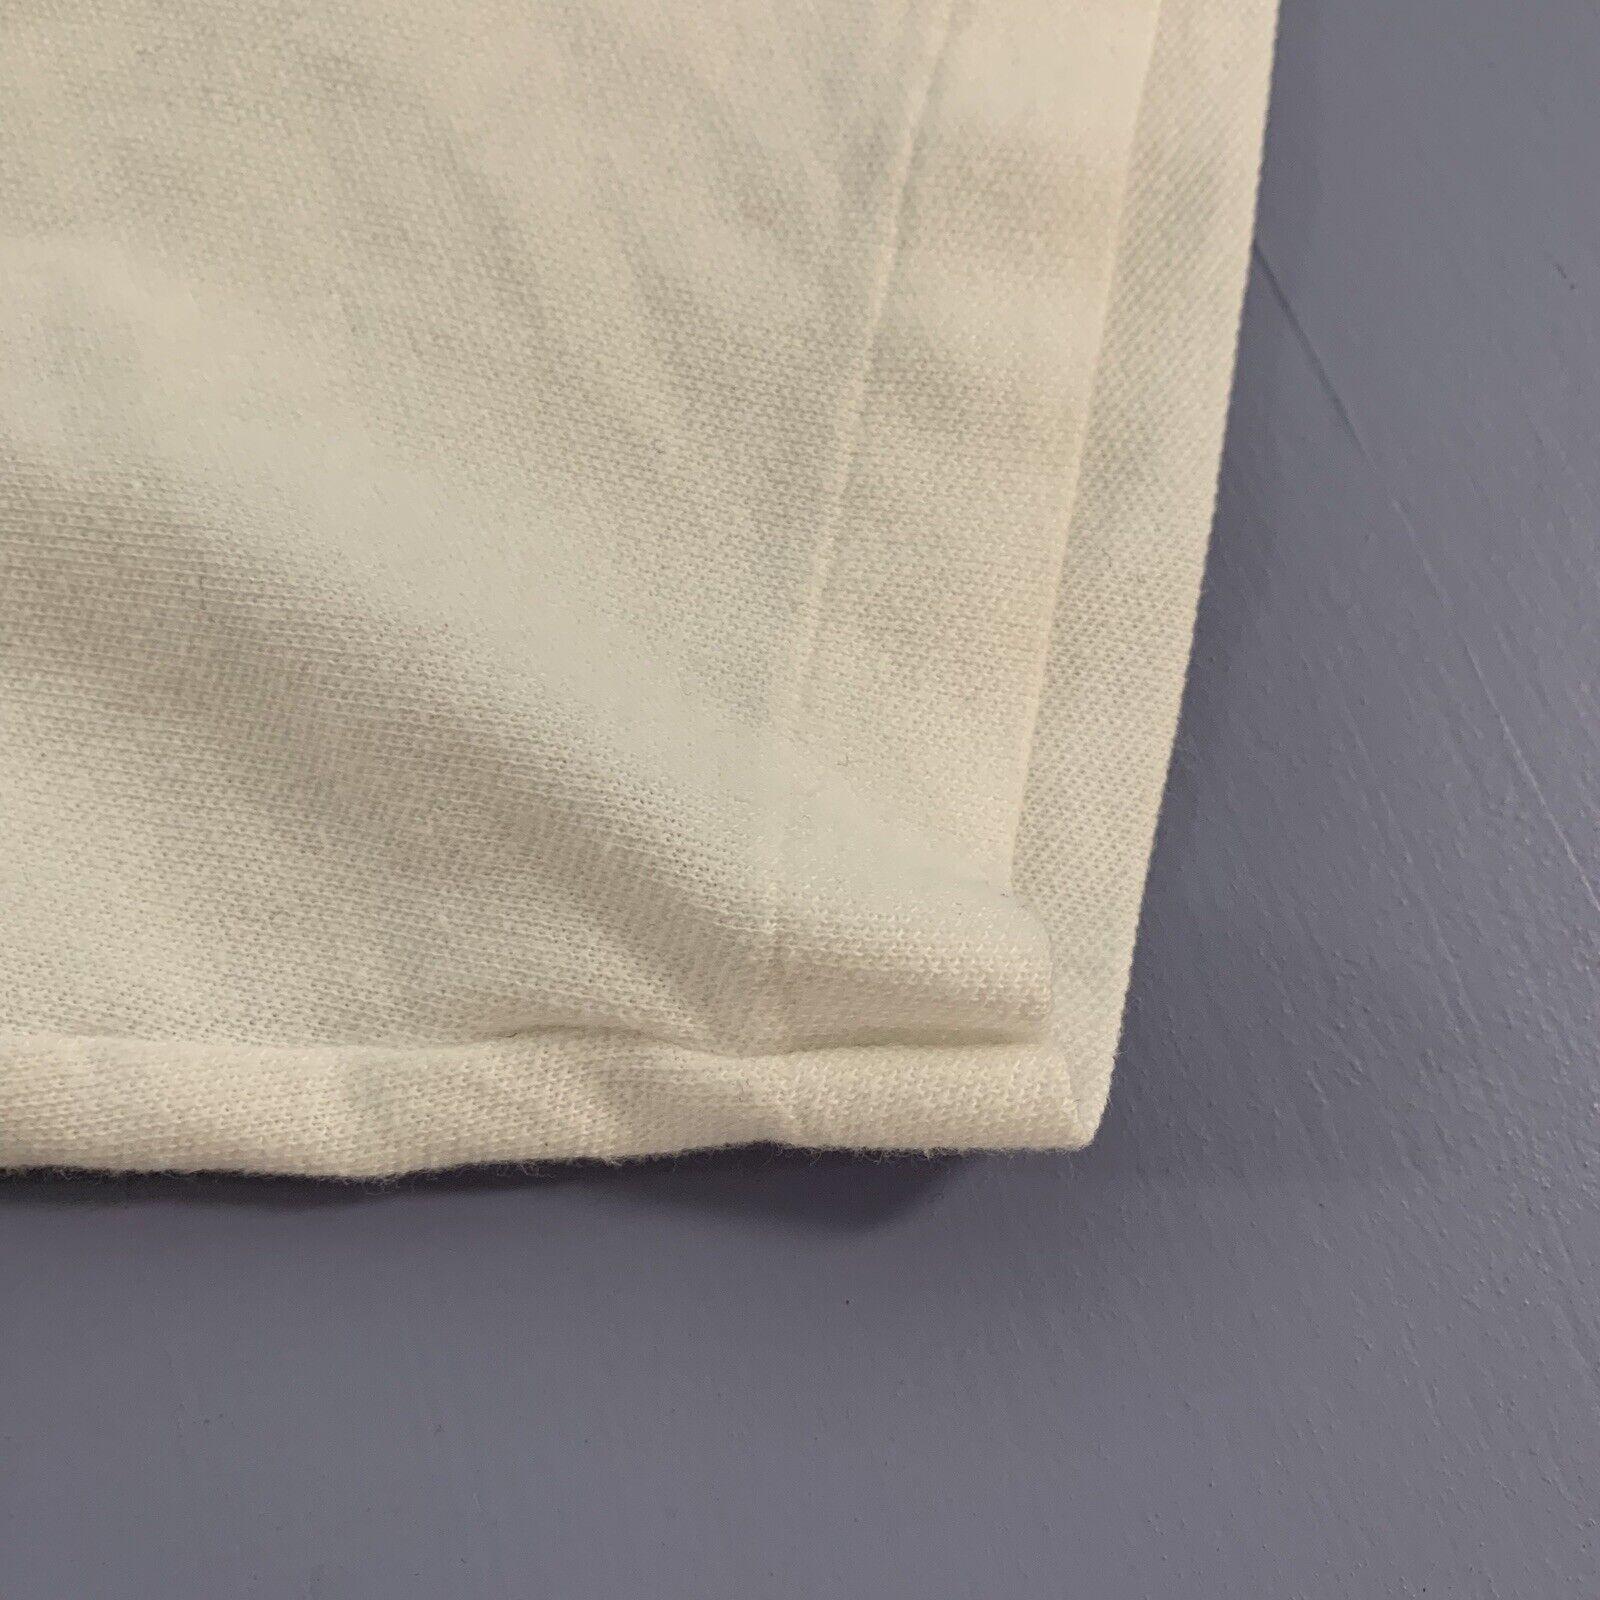 Vtg 80s 90s Polo Sport Tennis Shirt Single Stitch… - image 3